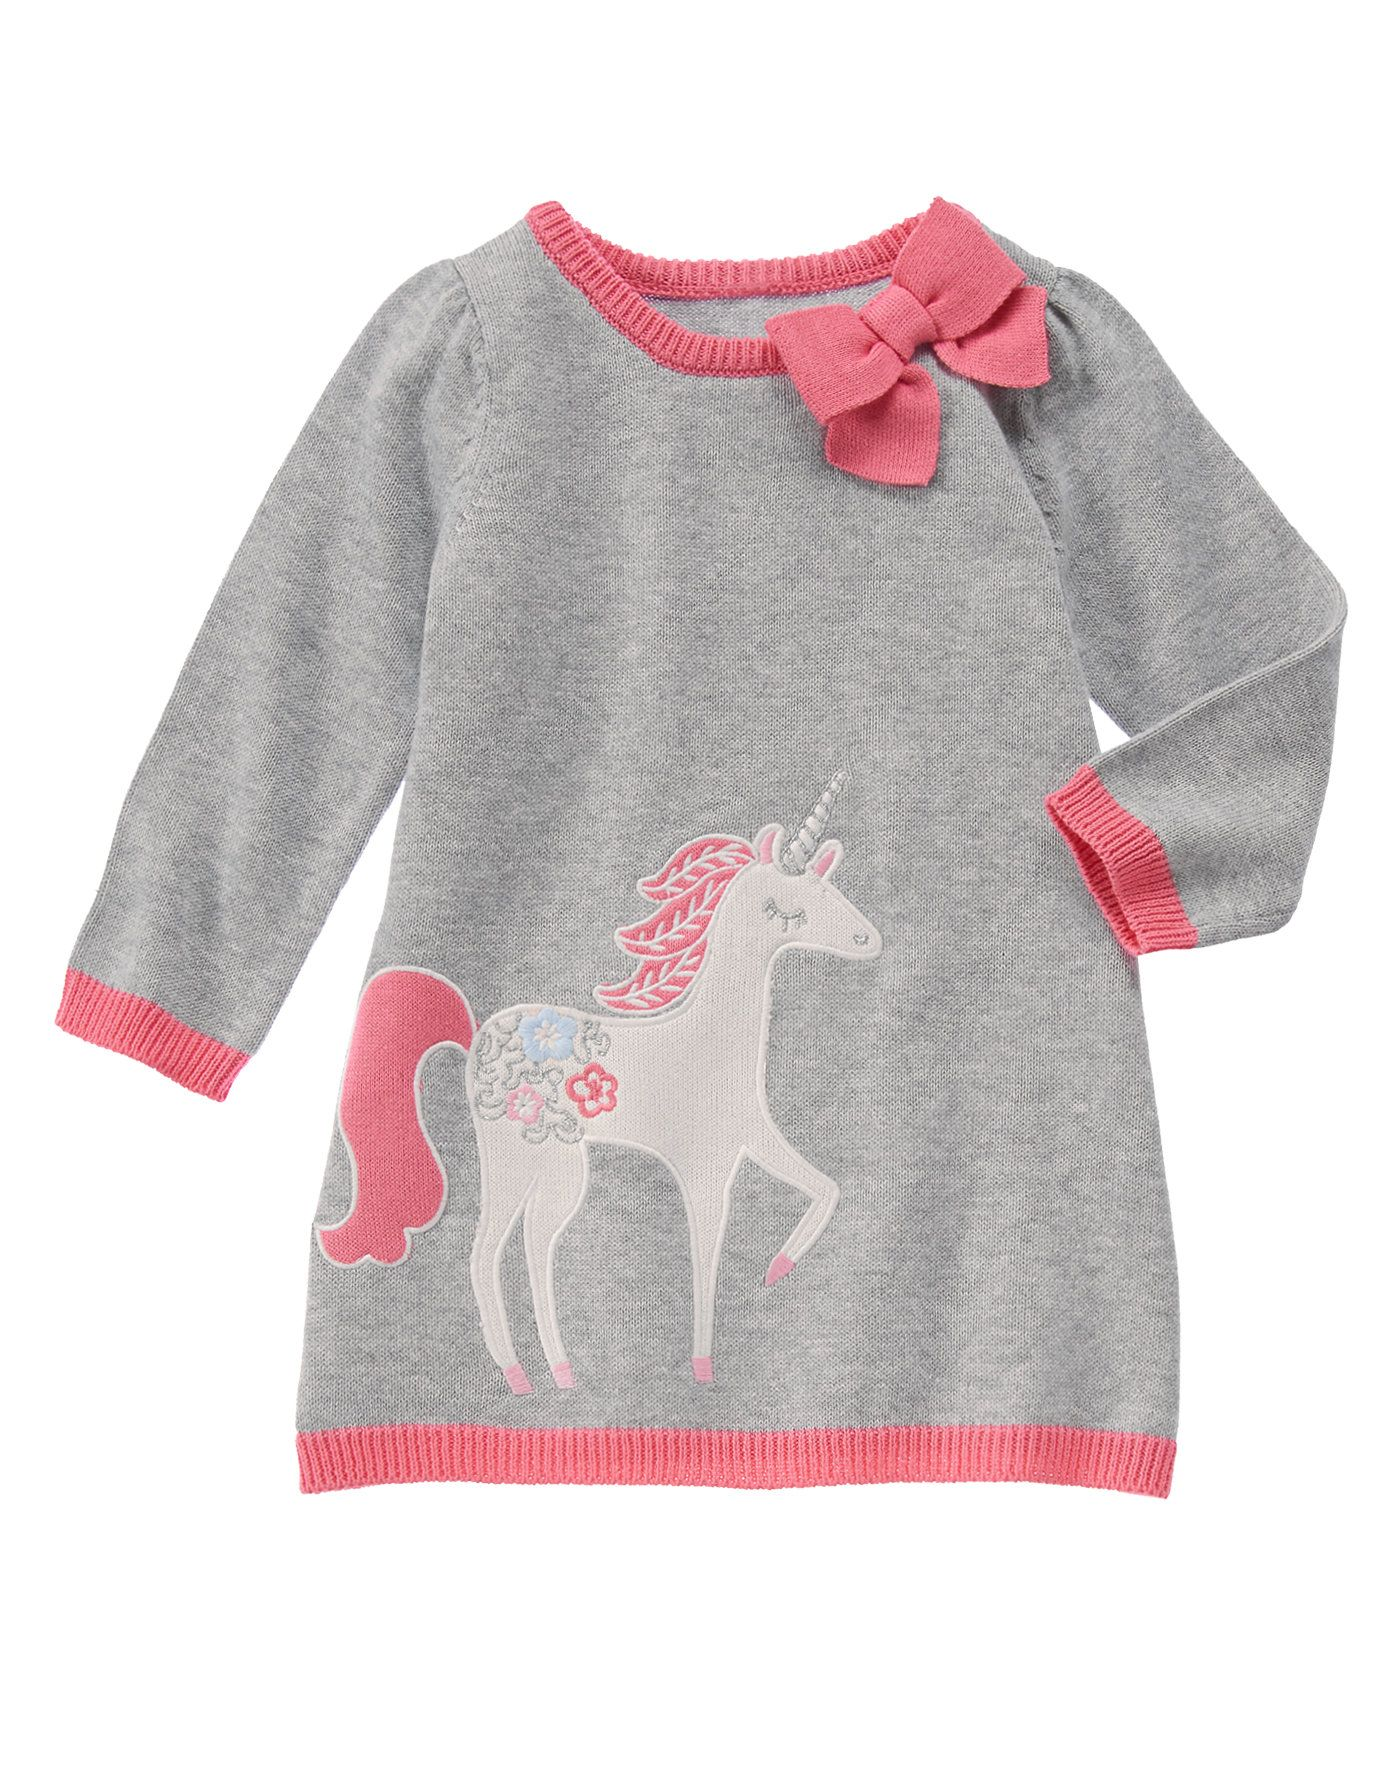 8fcddd2f6b32 Unicorn Sweater Dress Unicorn Dress Toddler, Unicorn Kids, Toddler Sweater  Dress, Unicorn Horse